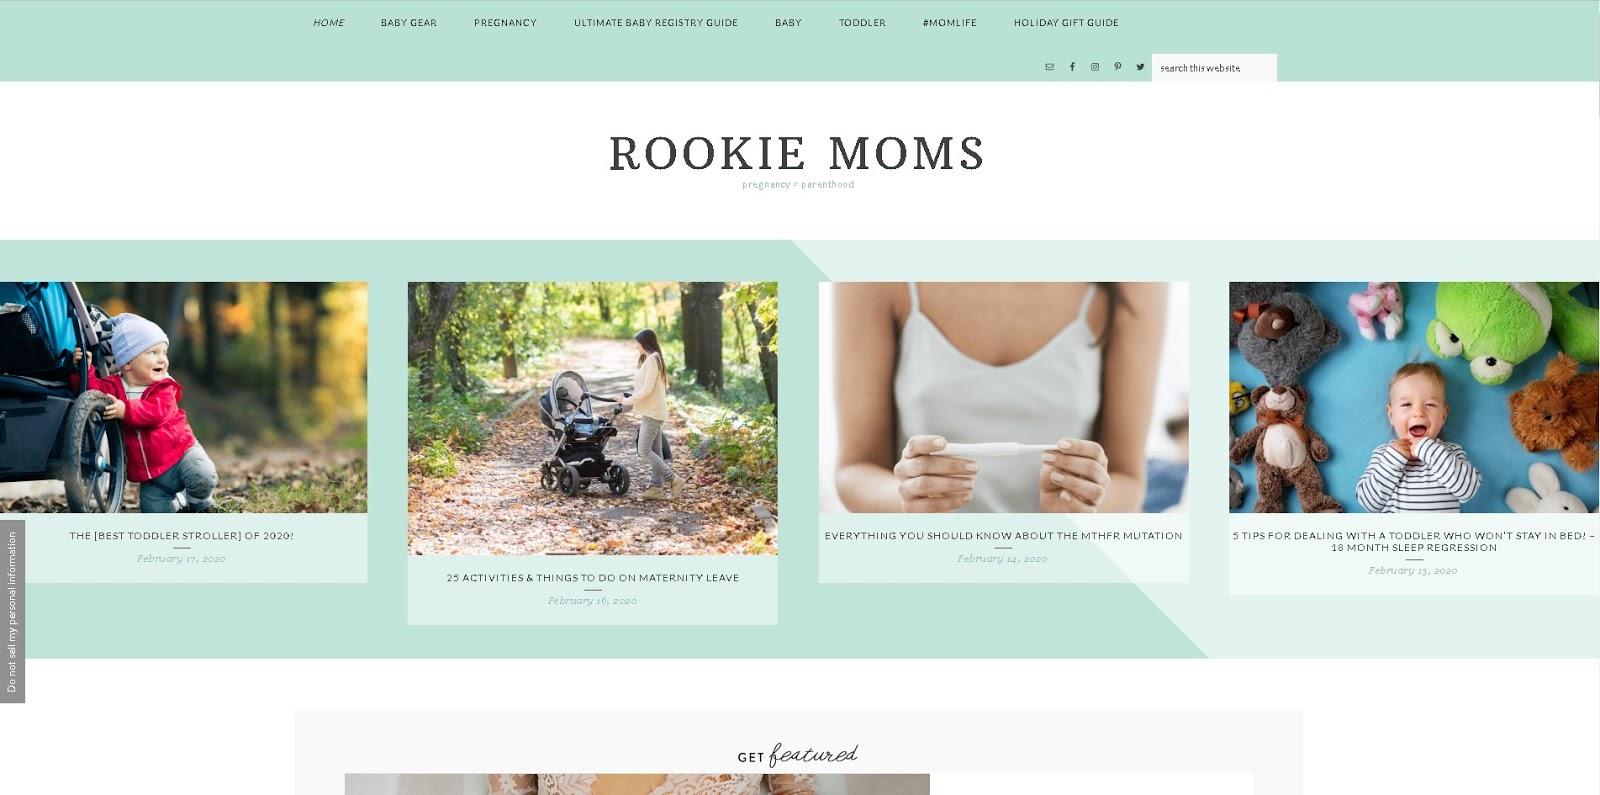 luchshie-blogi-mam-glavnaya-stranicza--rookie-moms-skrinshot